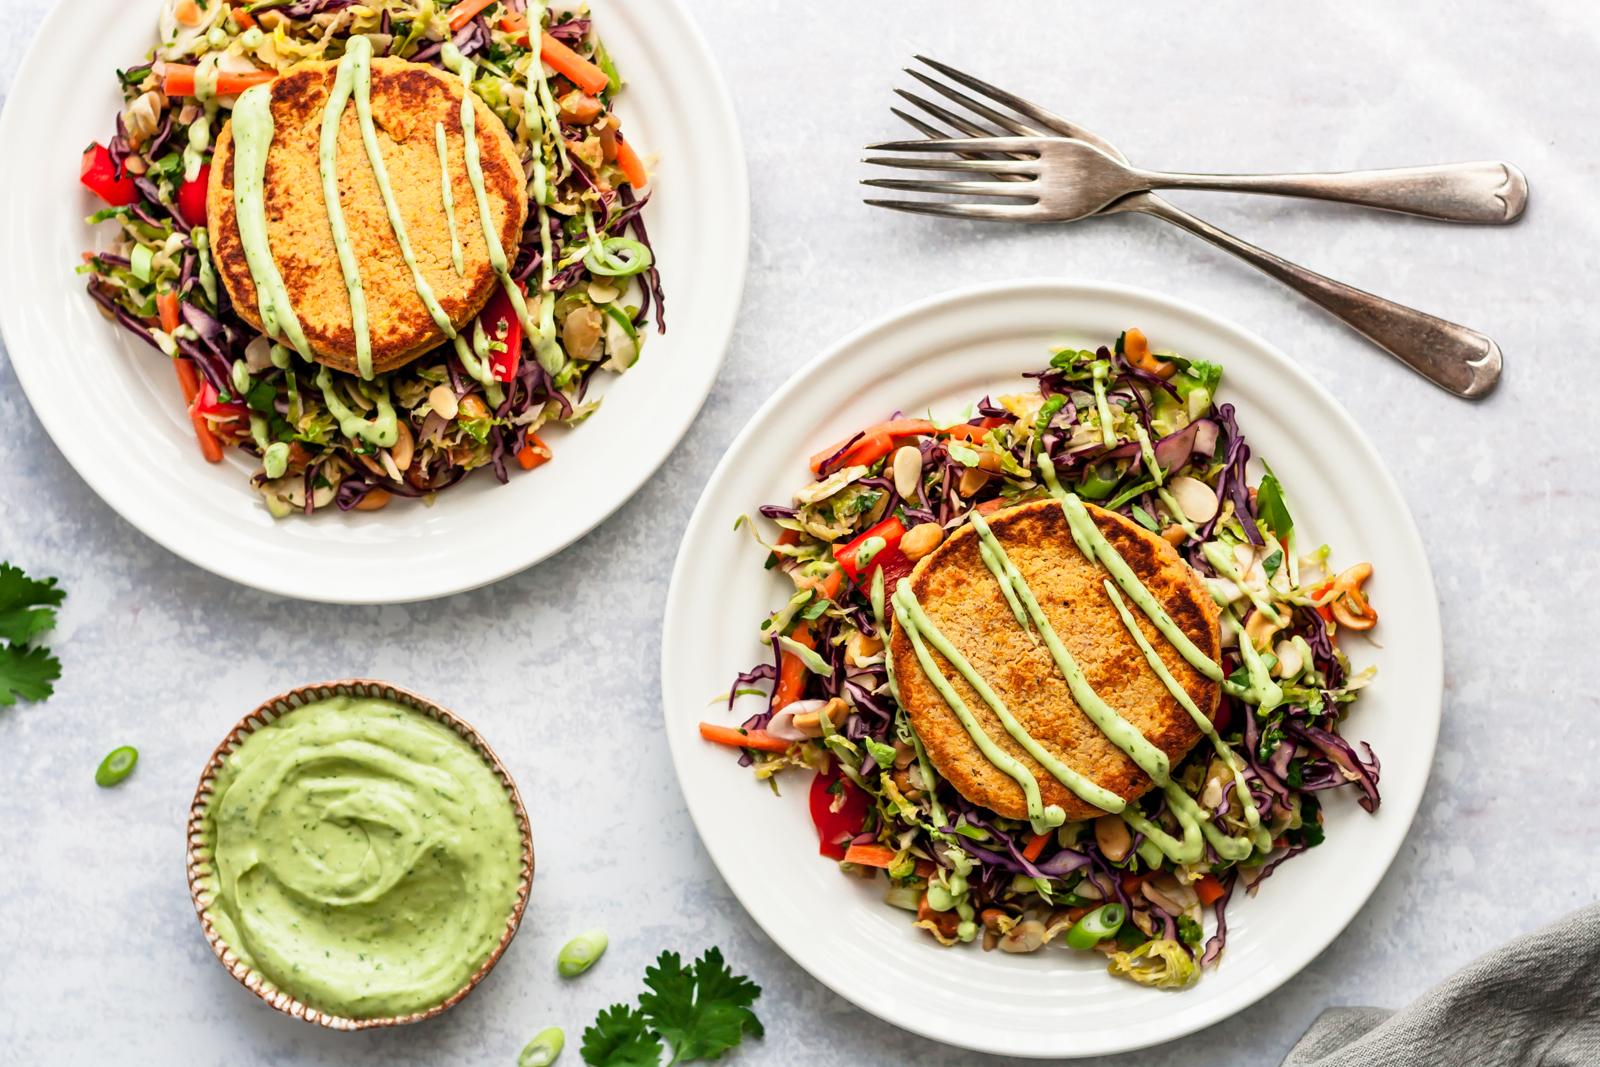 Low-calorie meals: 15-Minute Sweet Potato Salmon Cakes